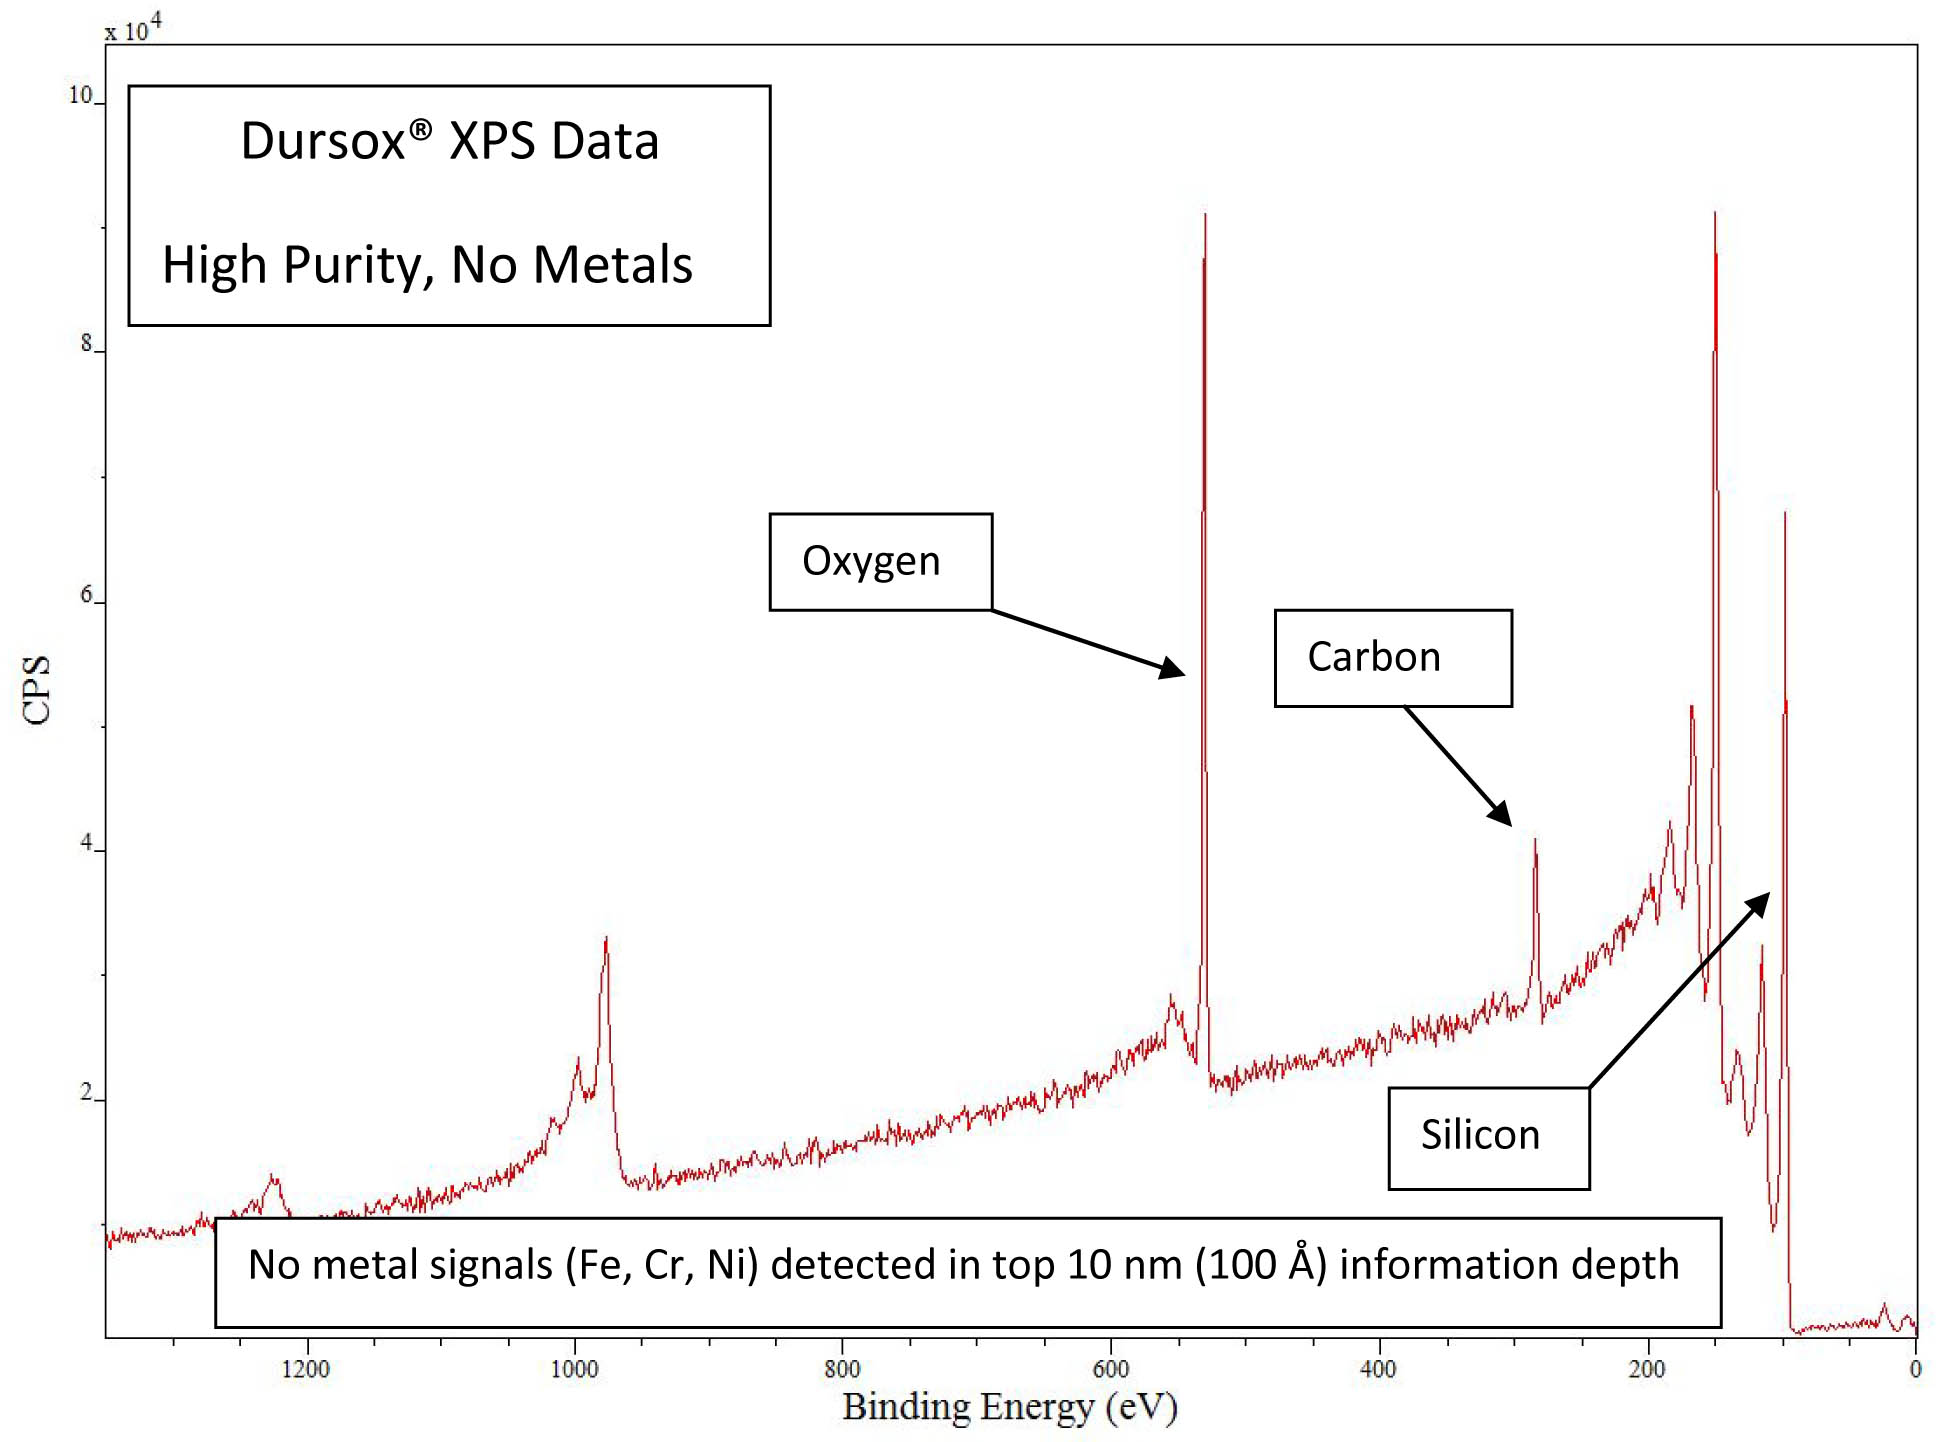 Dursox XPS Data 6 11 18